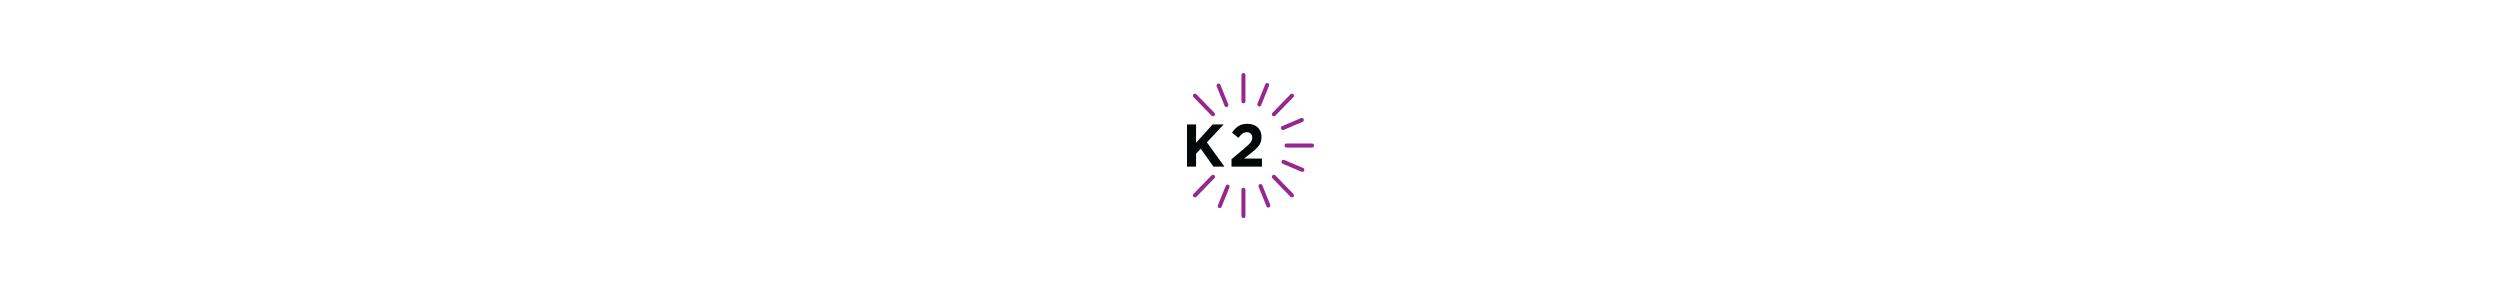 Yoga with K2: Basalt Colorado Yoga Teacher